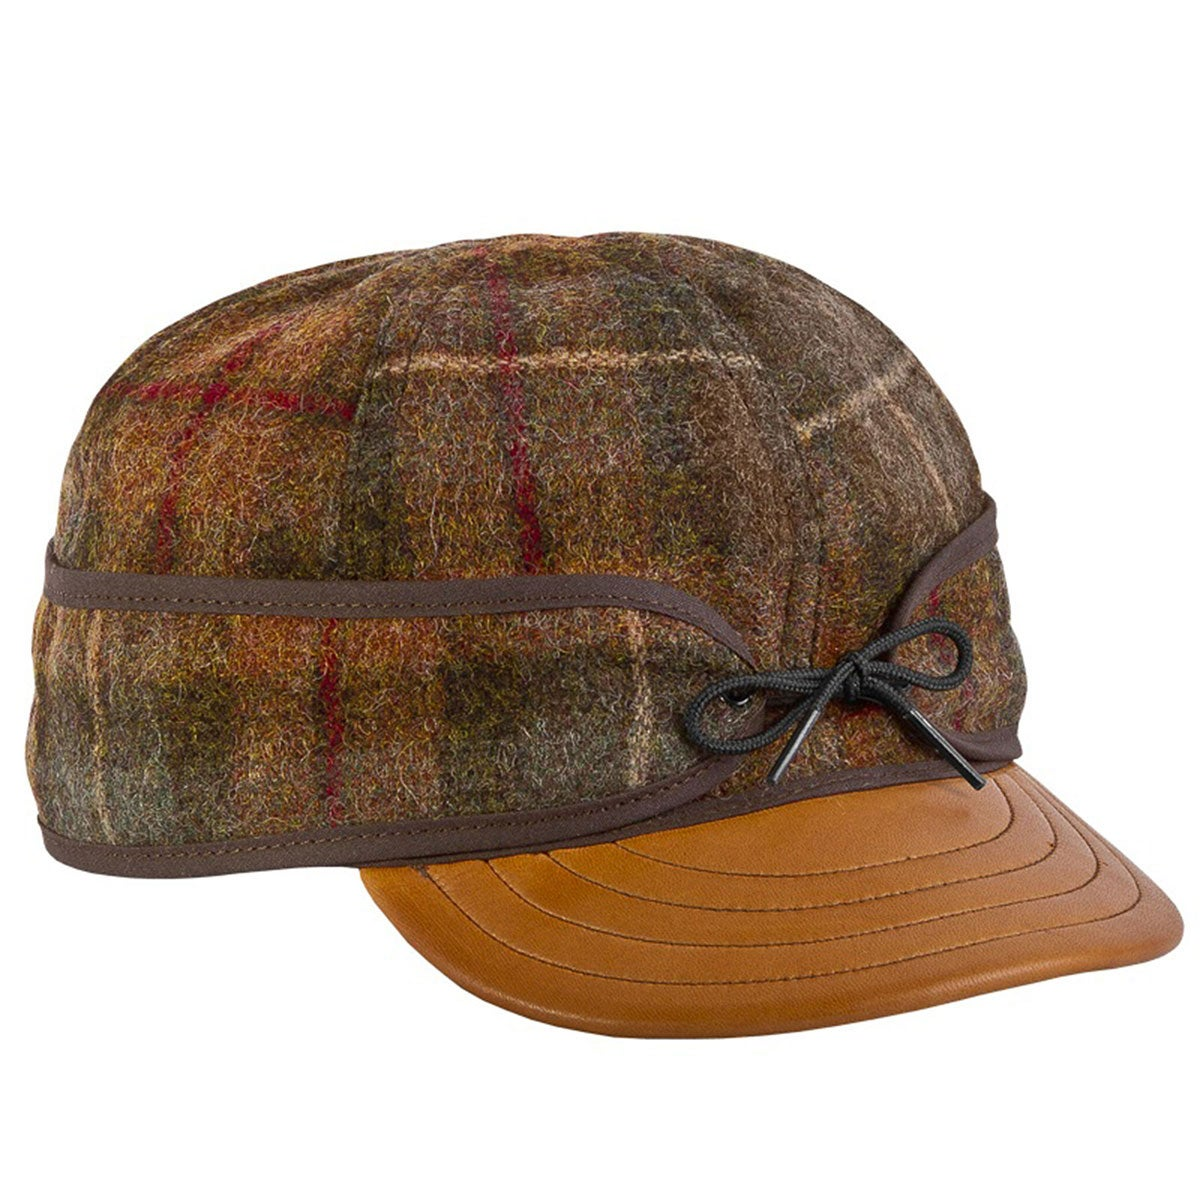 1930s Style Mens Hats Original Stormy Kromer Cap with Deerskin Brim $49.99 AT vintagedancer.com